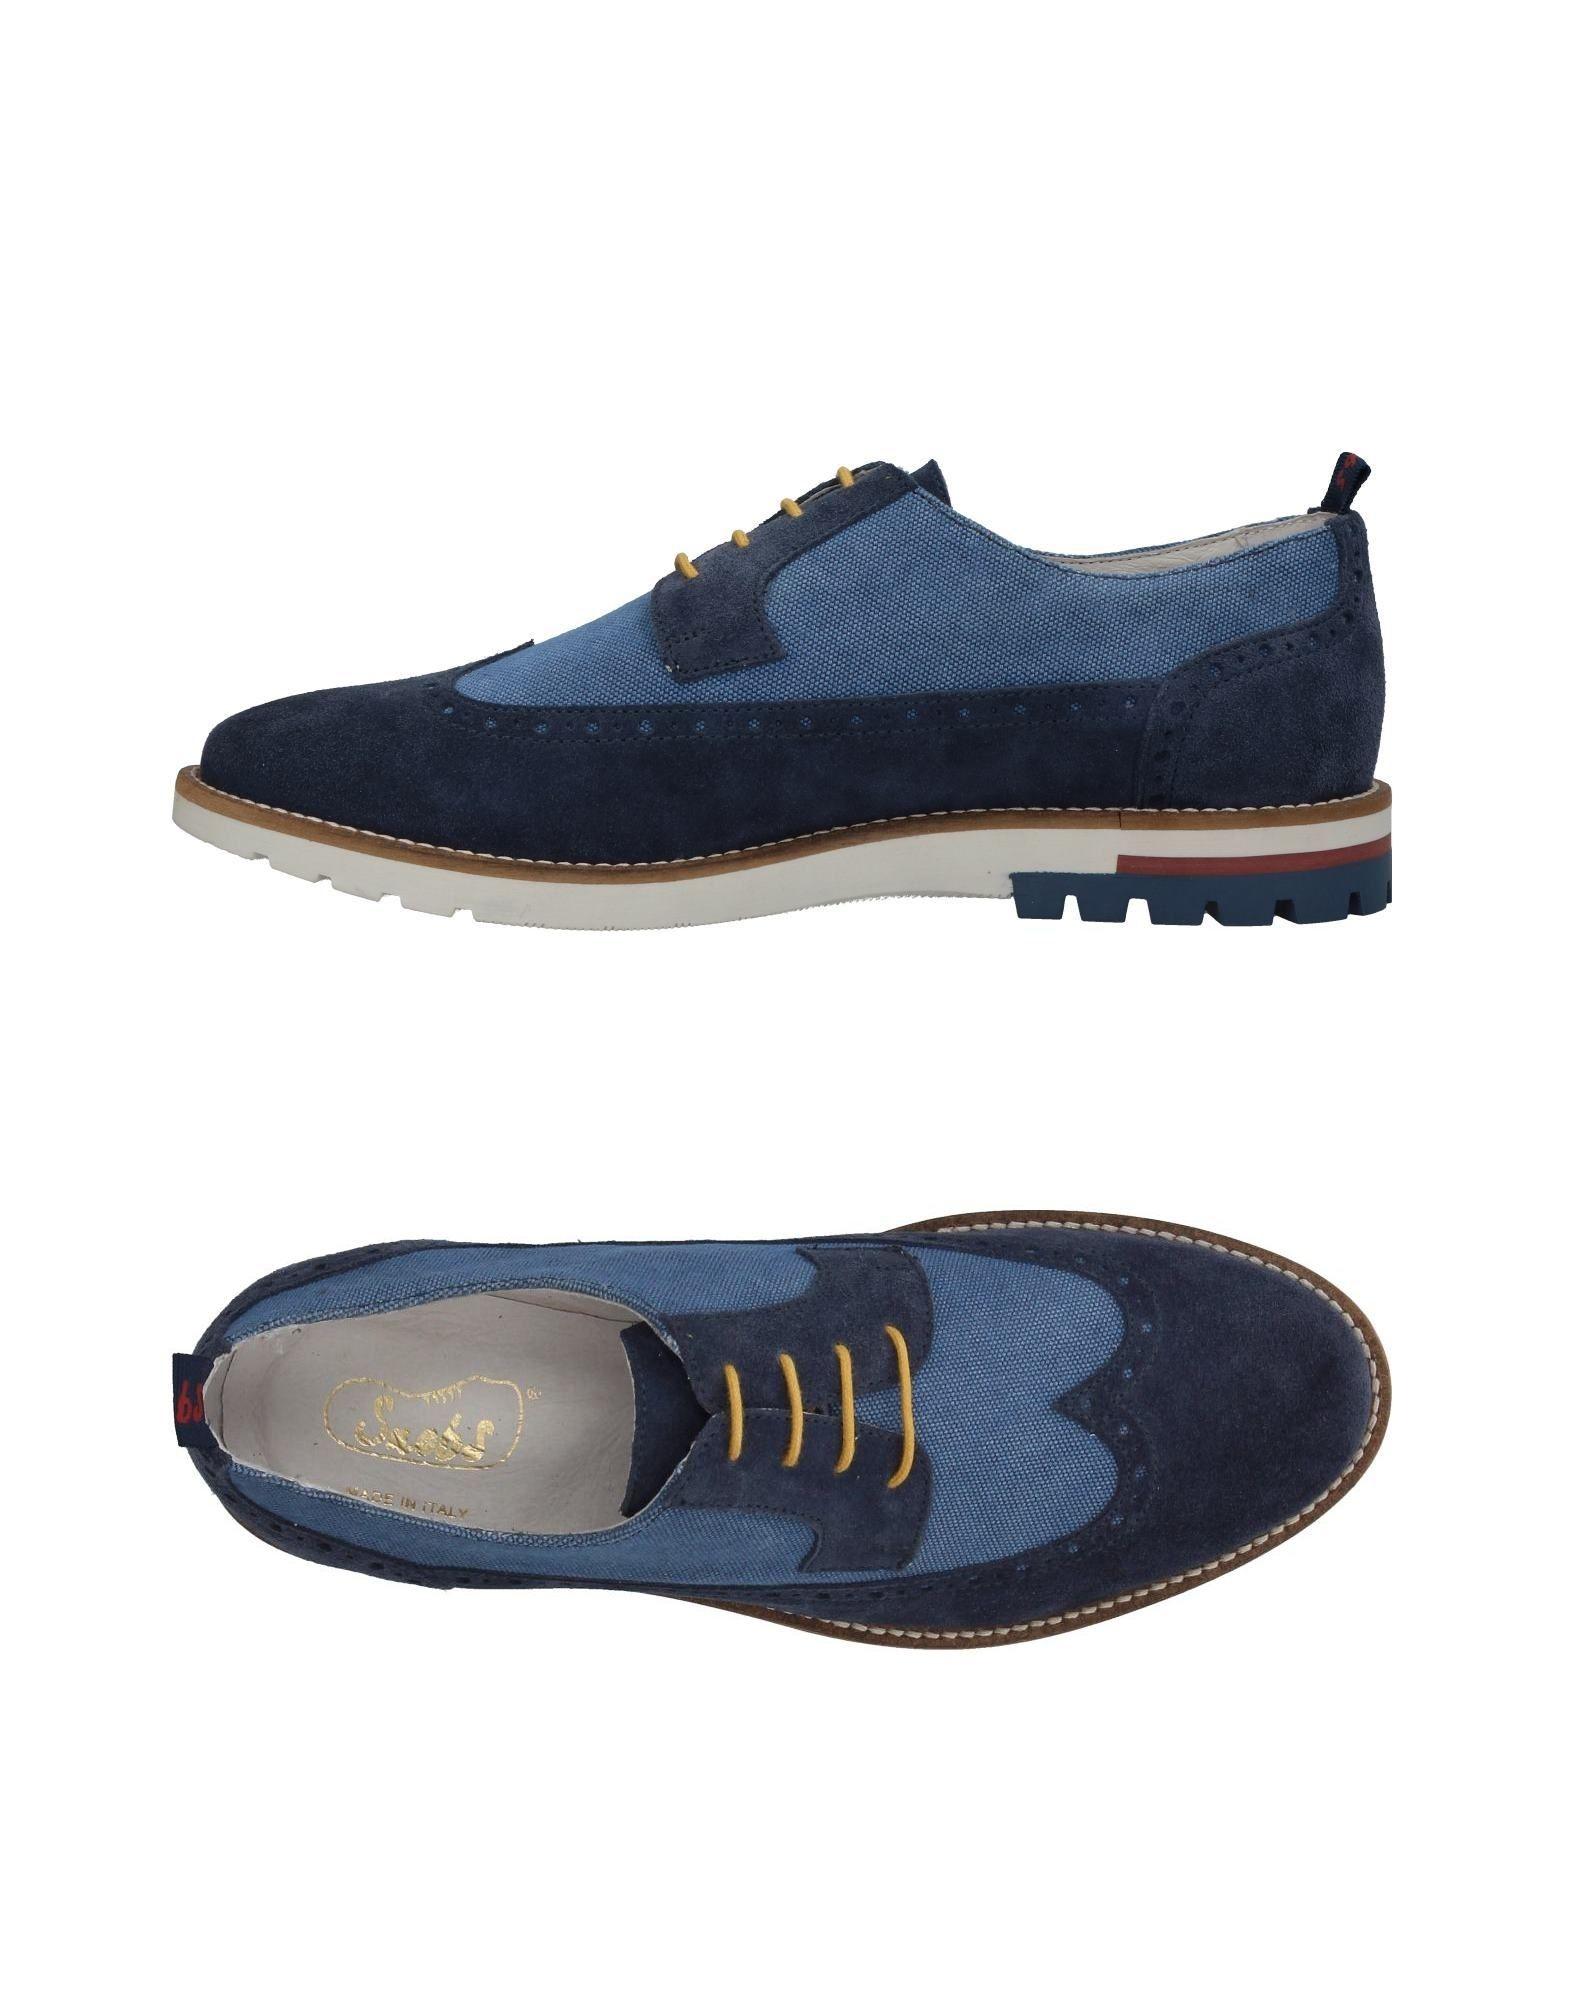 Rabatt echte Schuhe Snobs® Schnürschuhe Herren  11102498RB